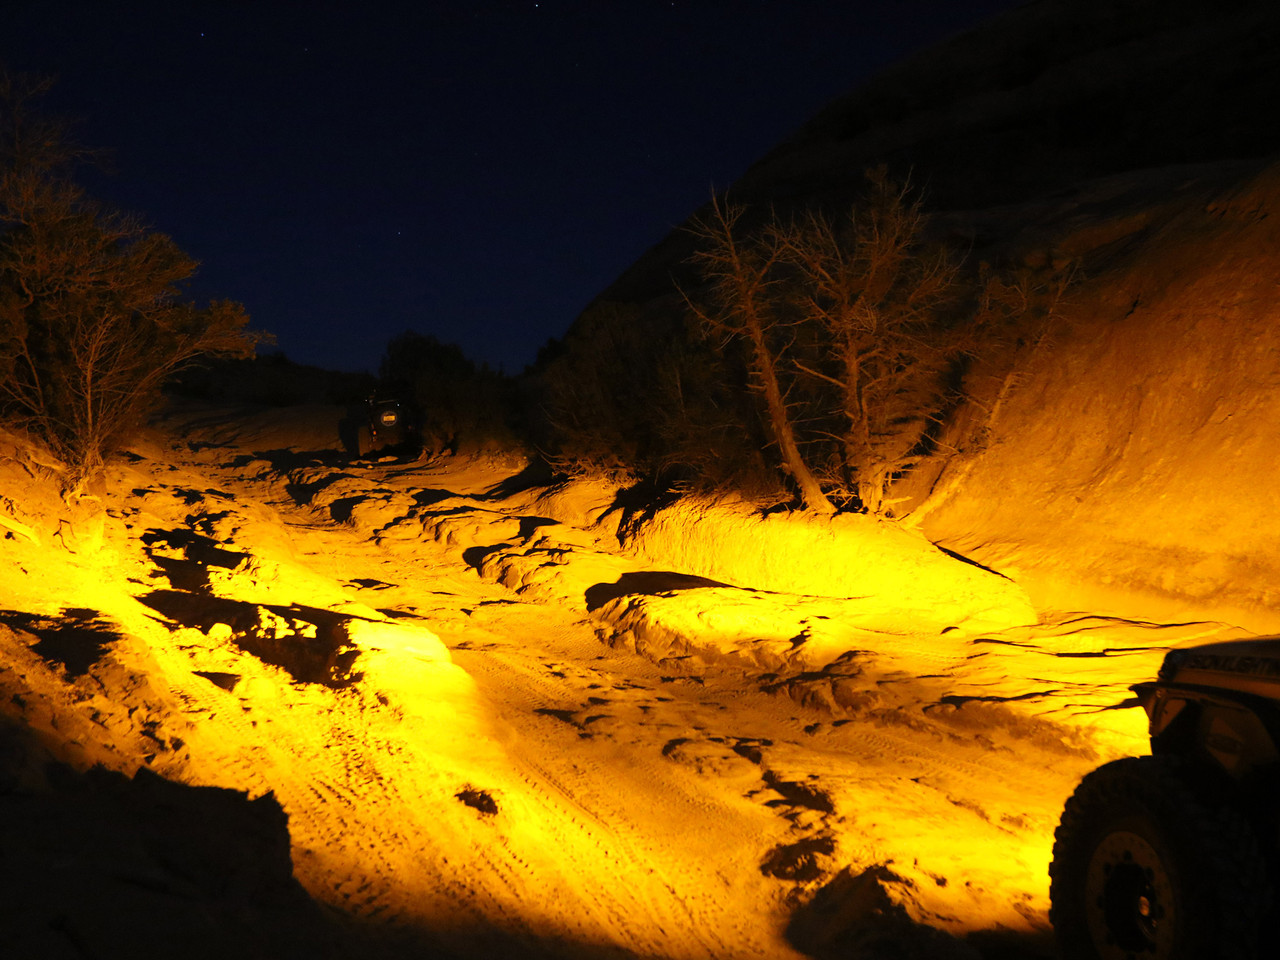 Amber Elliptical provides great night time lighting